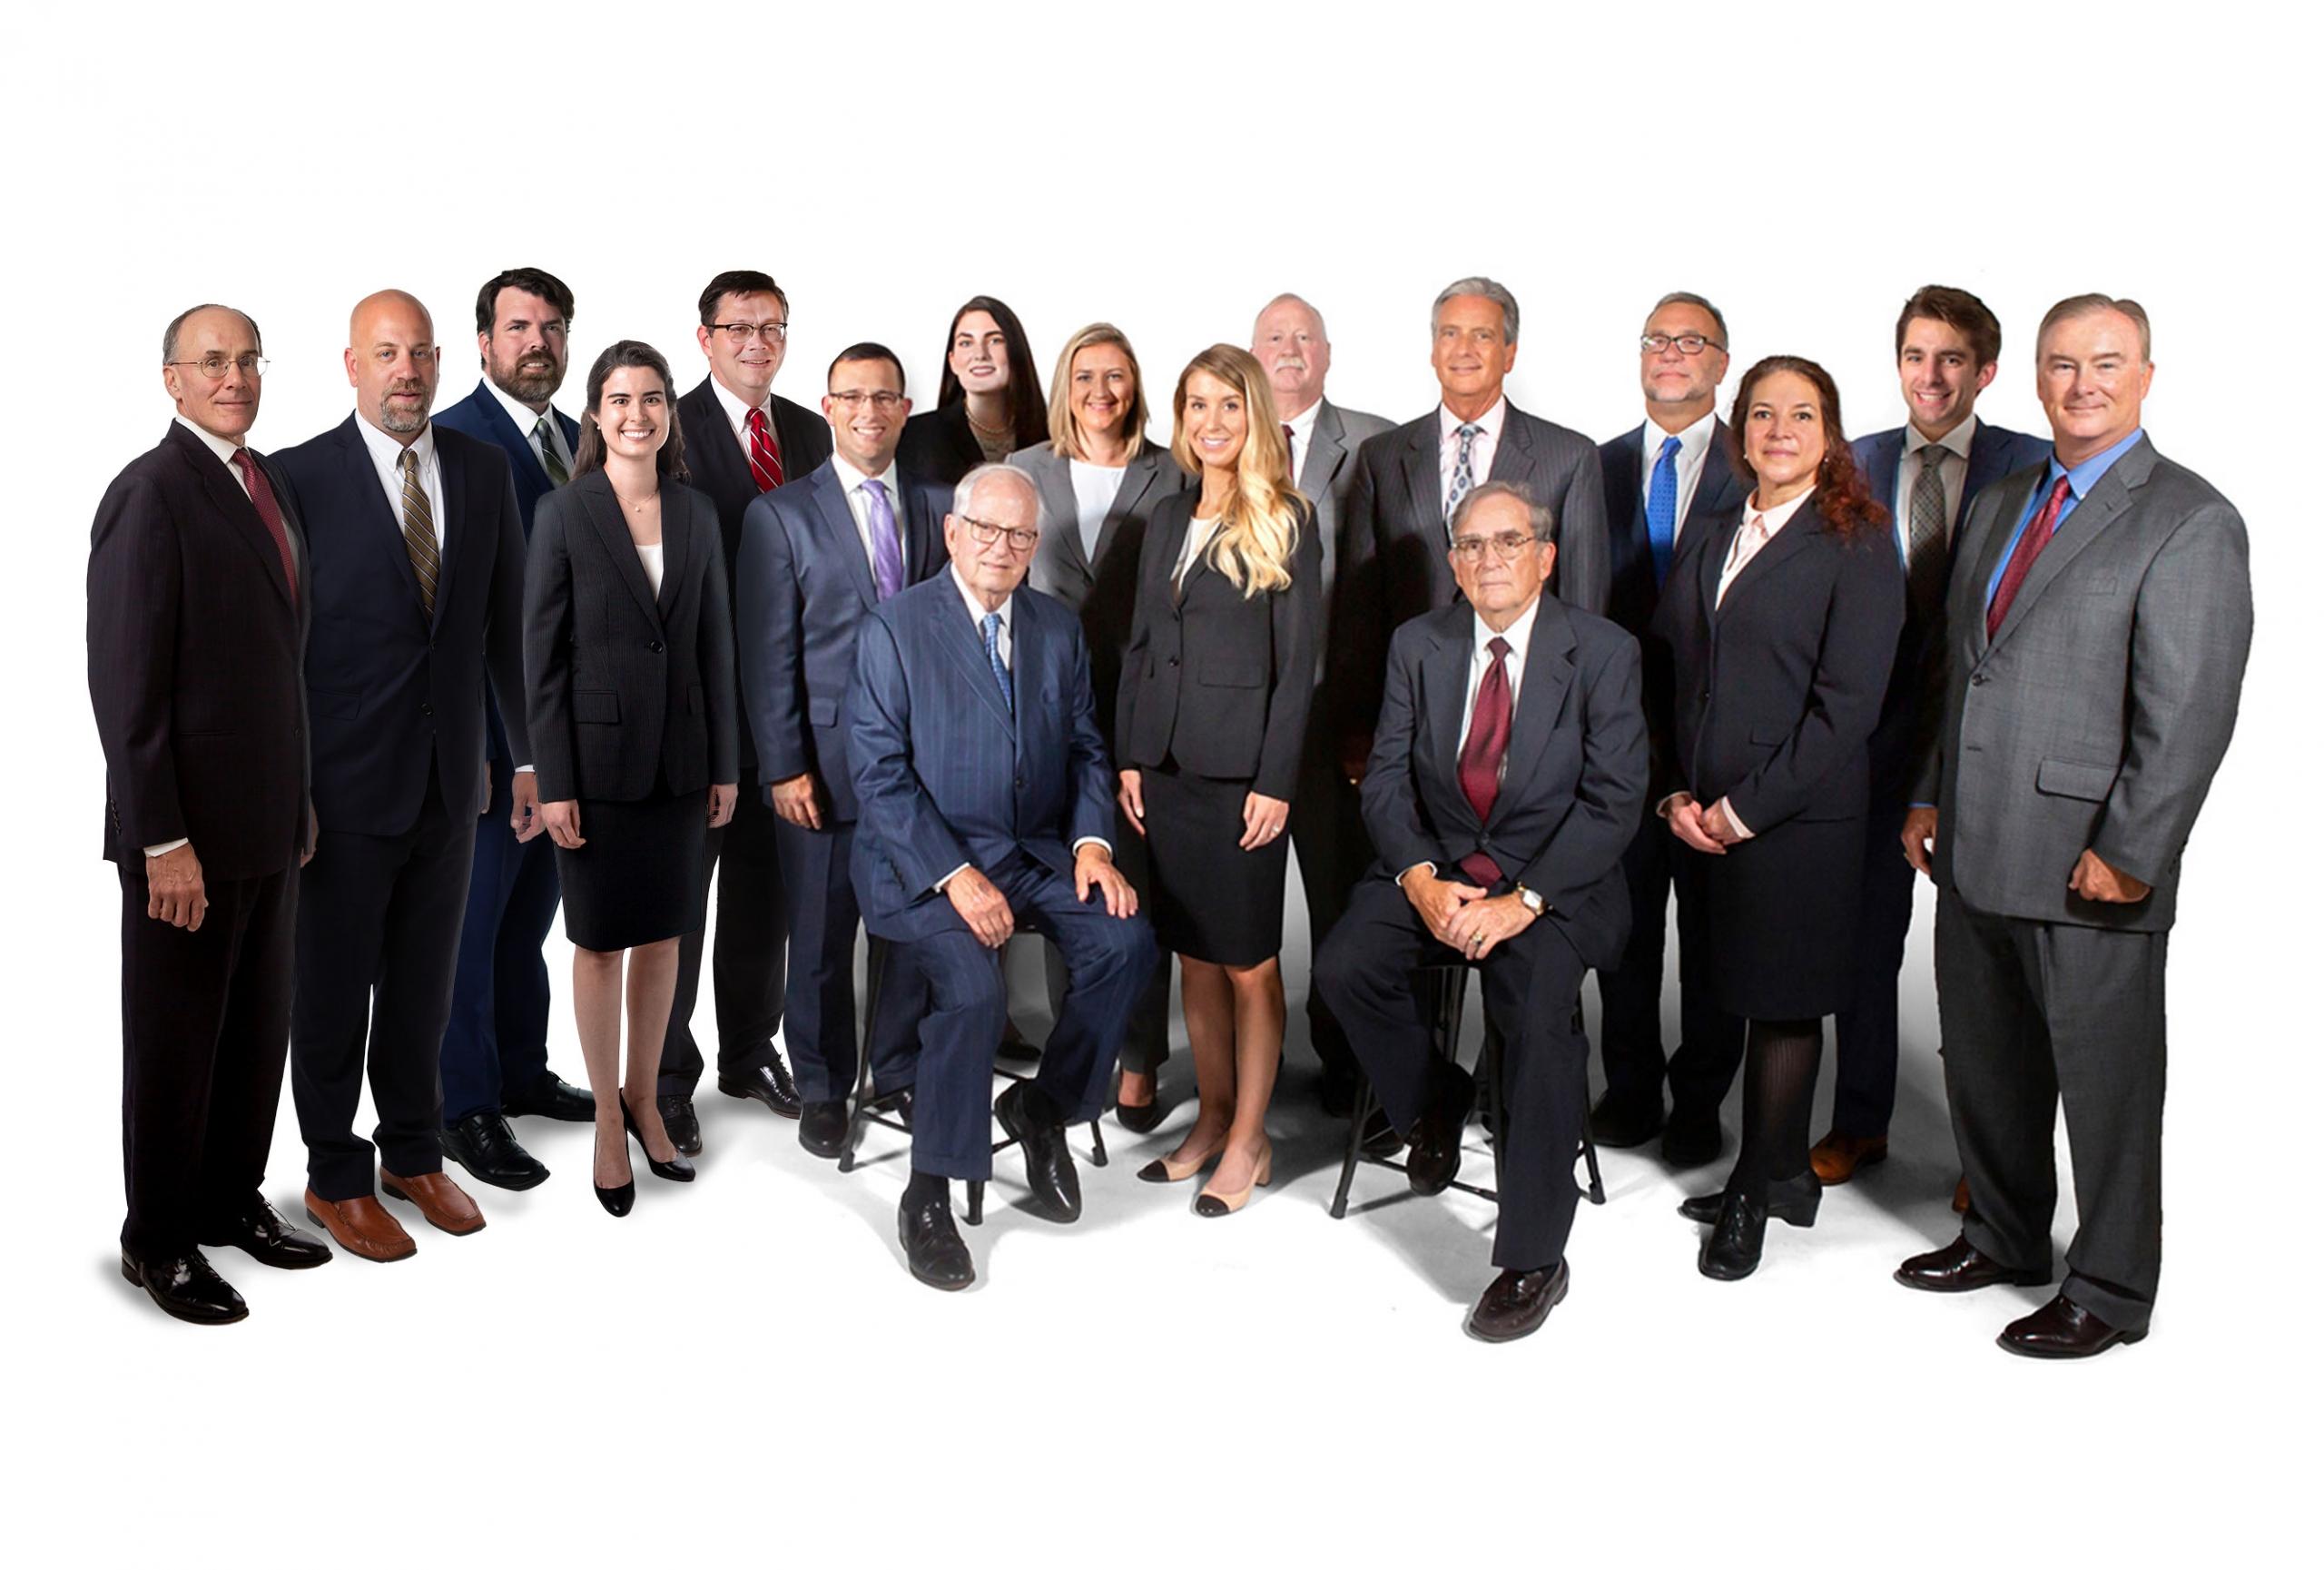 harrisonburg lawyers, staunton lawyers